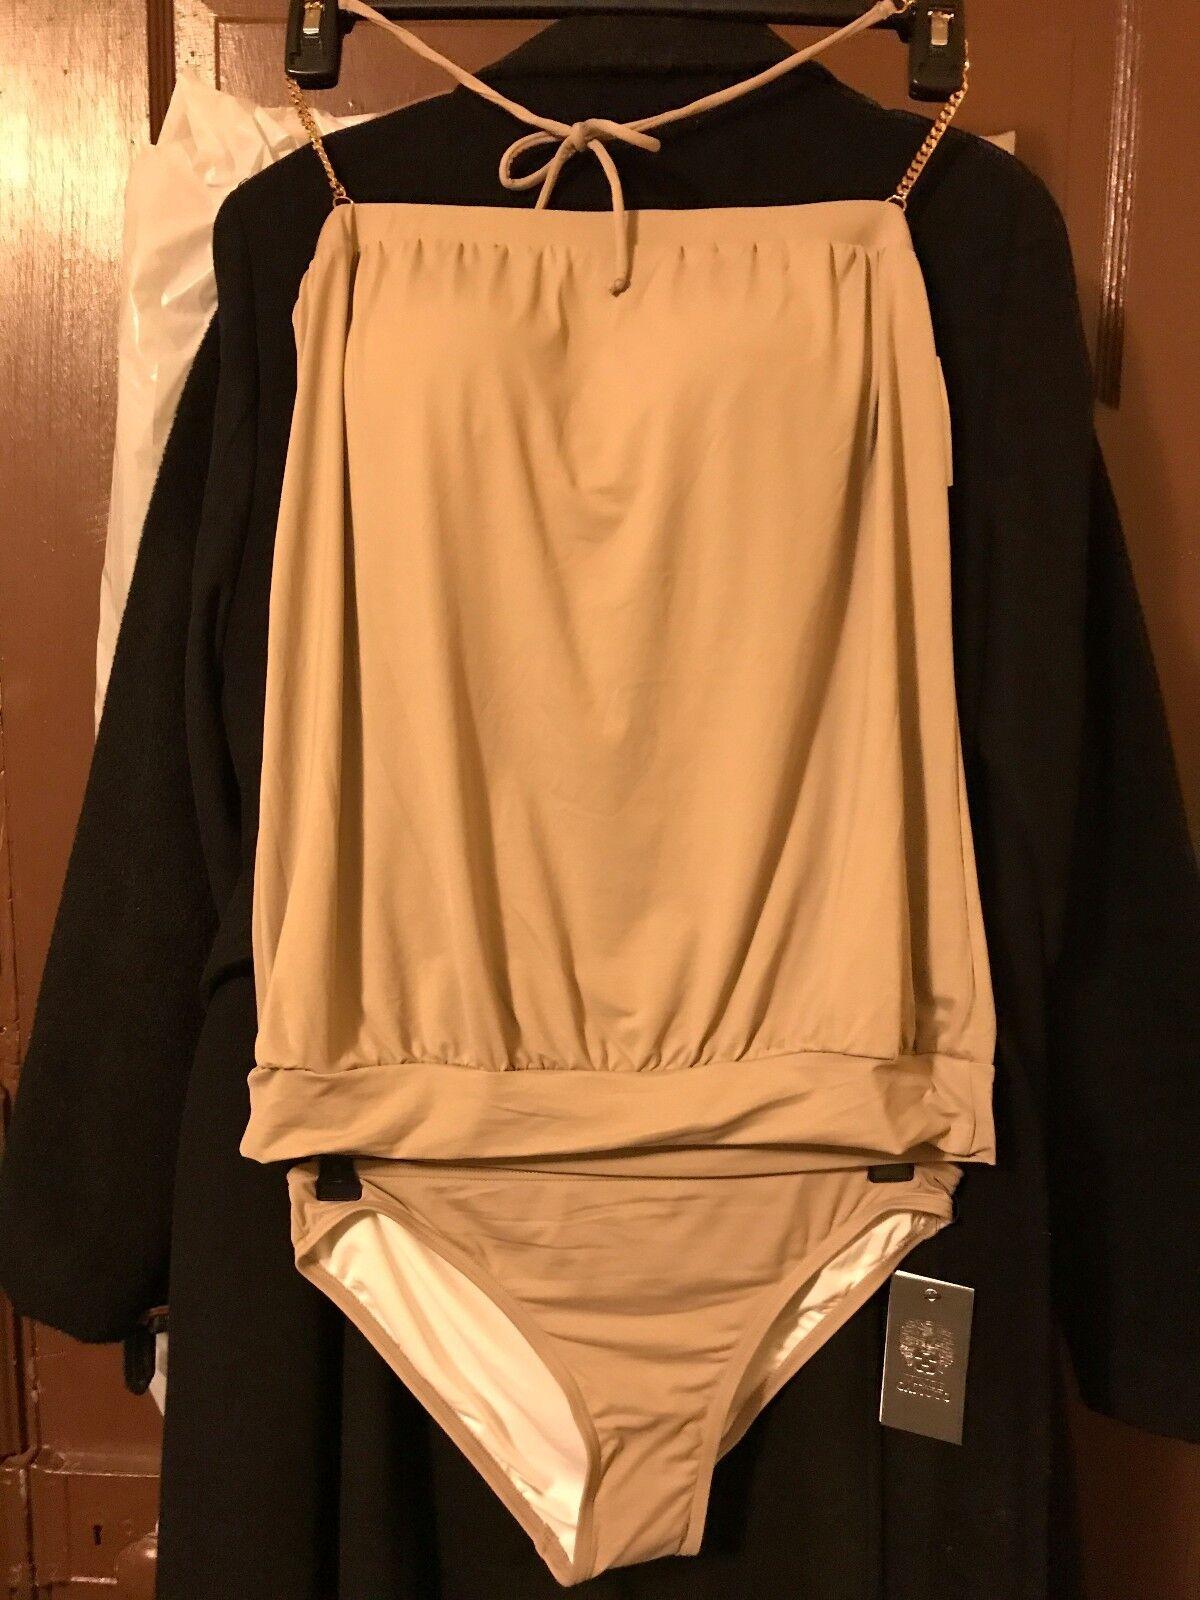 Vince Camuto Women's Small Collins Luxe Blouson Swimsuit Reg.  134